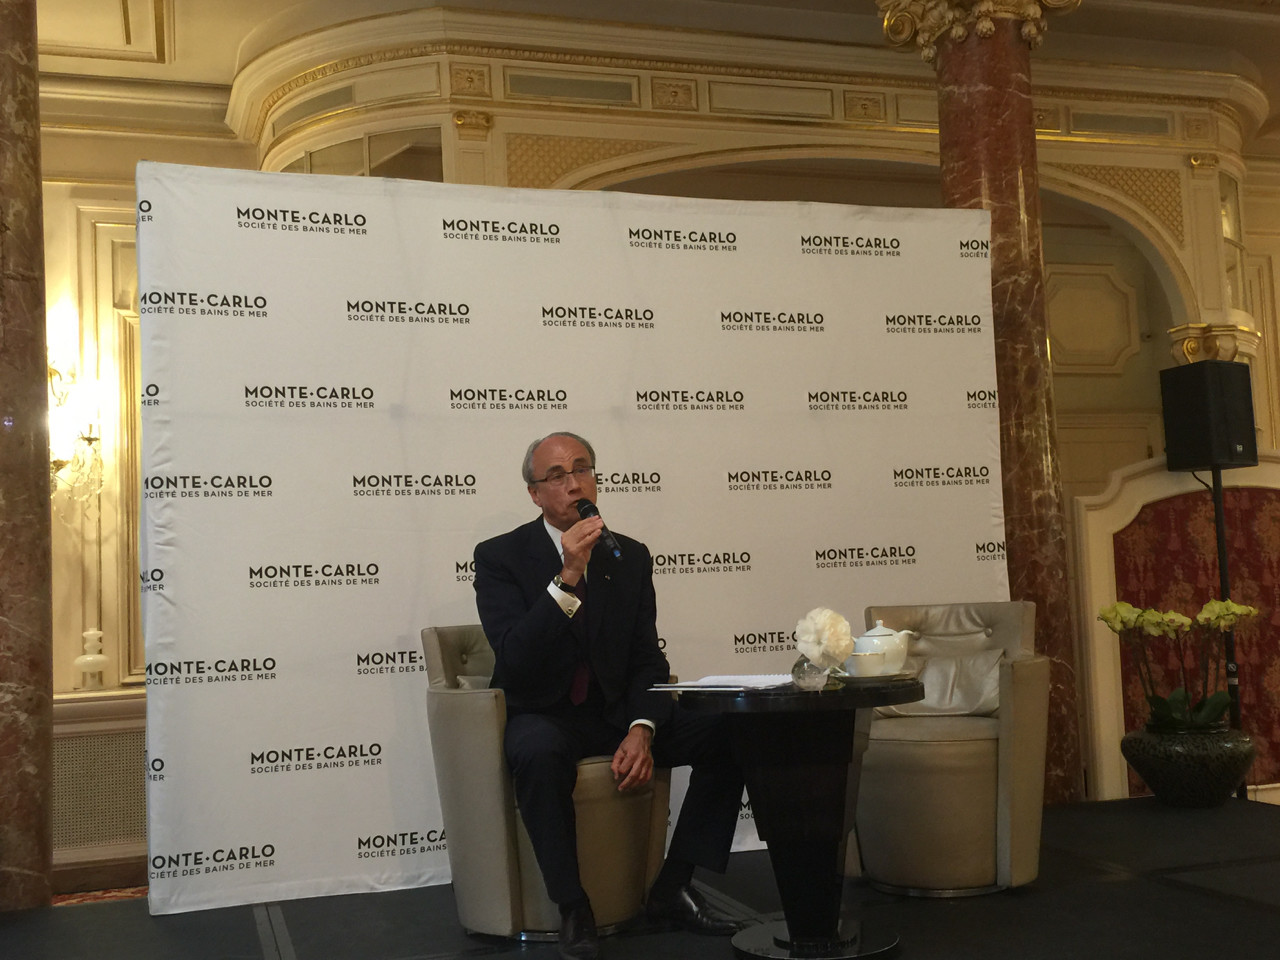 SBM's CEO Jean-Luc Biamonti